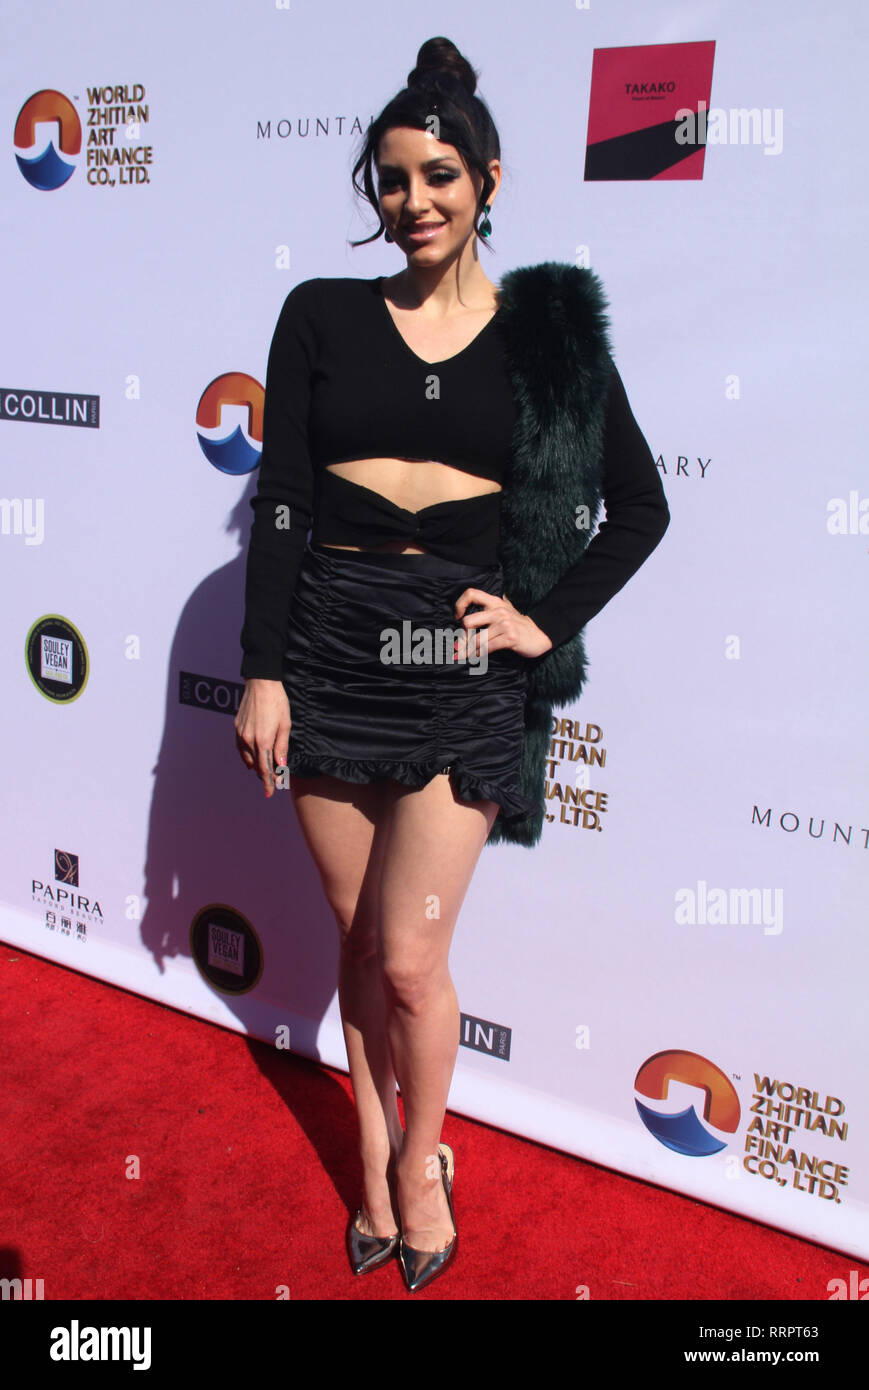 Bikini Rachele Royale nudes (59 photo), Ass, Sideboobs, Twitter, cleavage 2020